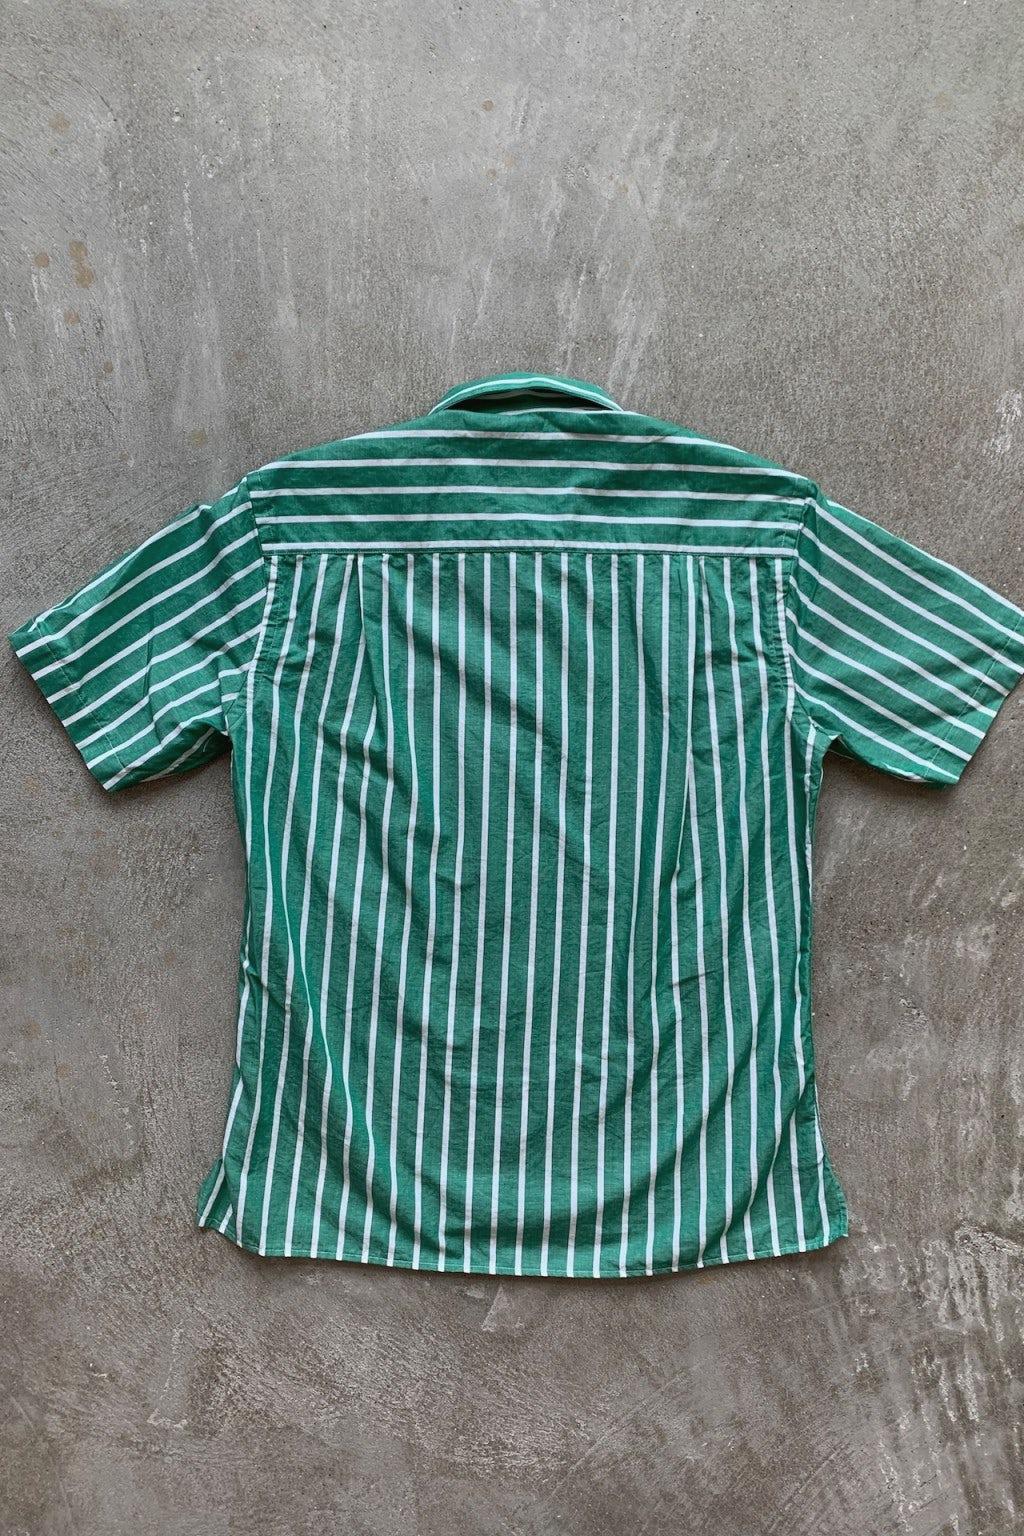 Gitman Bros. Vintage Camp Shirt  White/Green Stripe